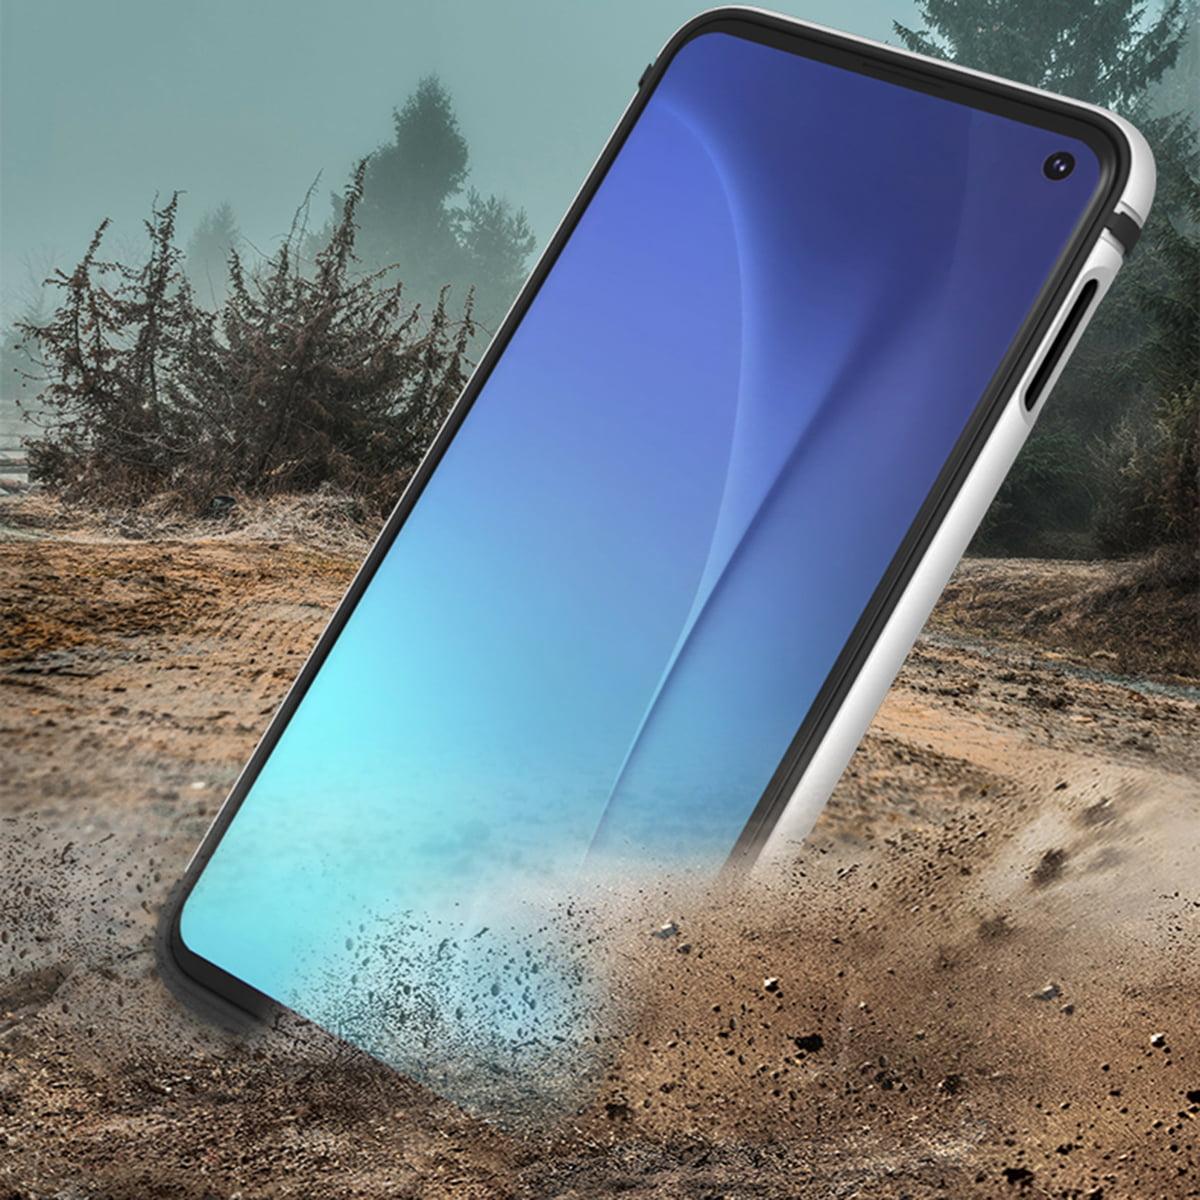 Blau Bakicey H/ülle f/ür Samsung Galaxy S10 Lite H/ülle HandyH/ülle 3 in 1 Ultra D/ünn Design Kratzfest Matt Schutzh/ülle Hart Plastik Hybrid Case Slim Hardcase R/ückseite Handytasche Cover